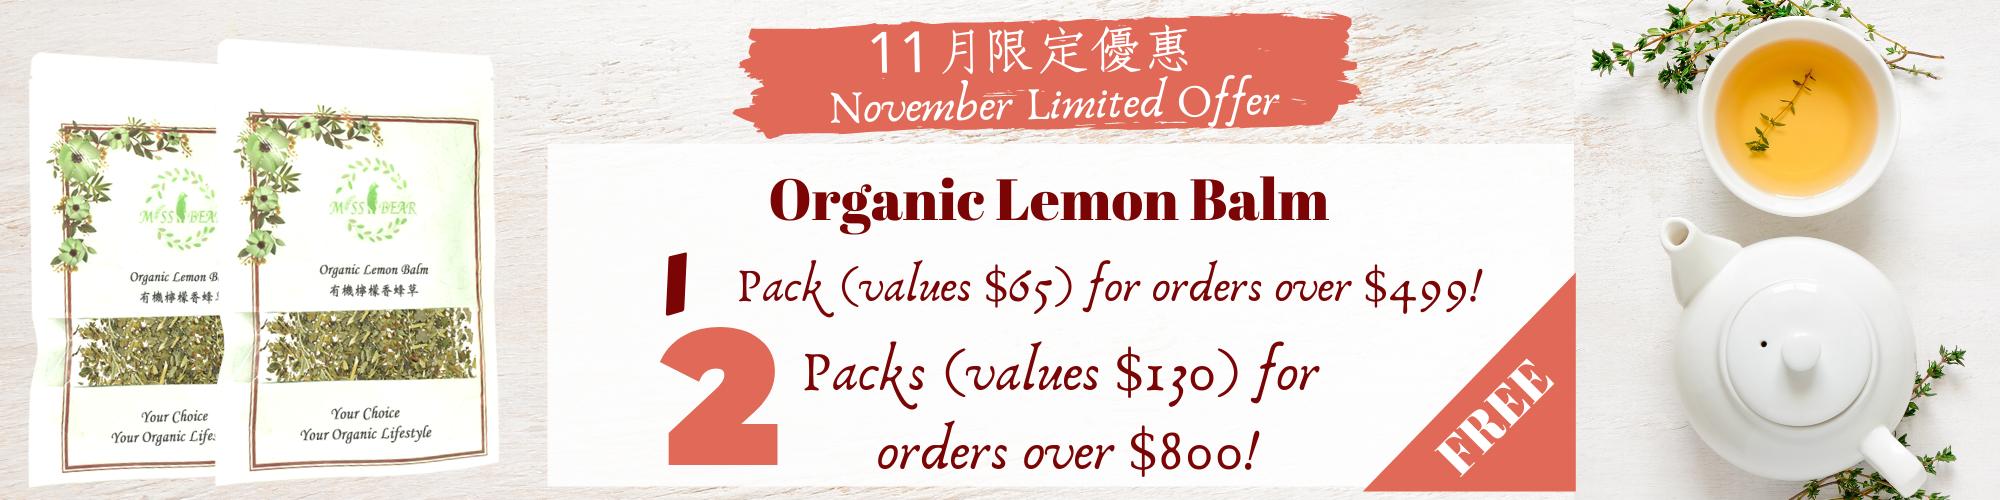 MissBear Lemon Balm Free Gift11月優惠有機檸檬香蜂草